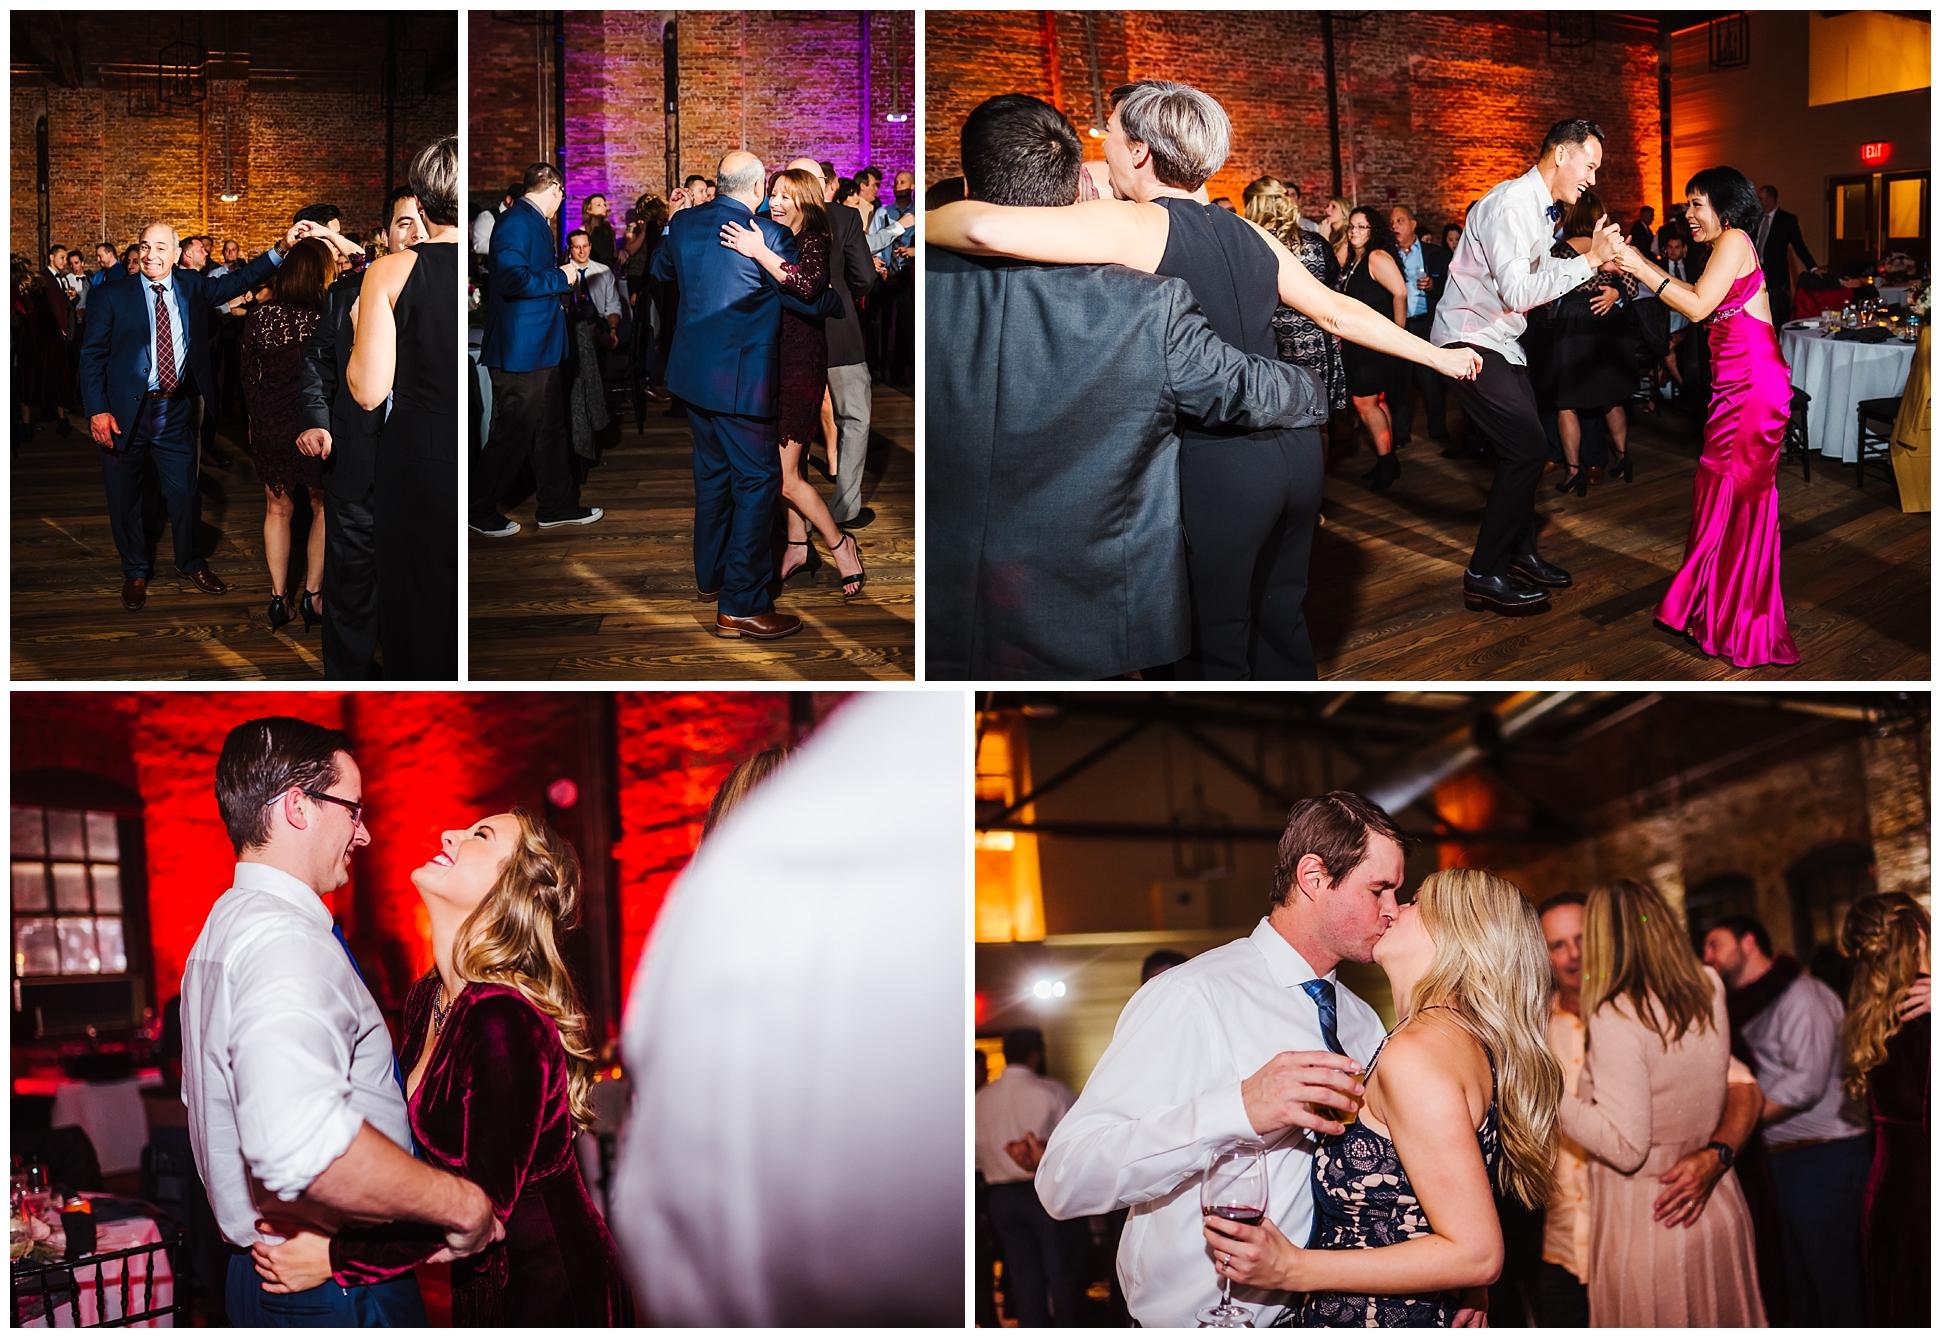 tampa-armeture-wedding-photographer-edgy-industrial-downtown-fancy-free-nursery-tattoo-burgandy-velvet_0083.jpg